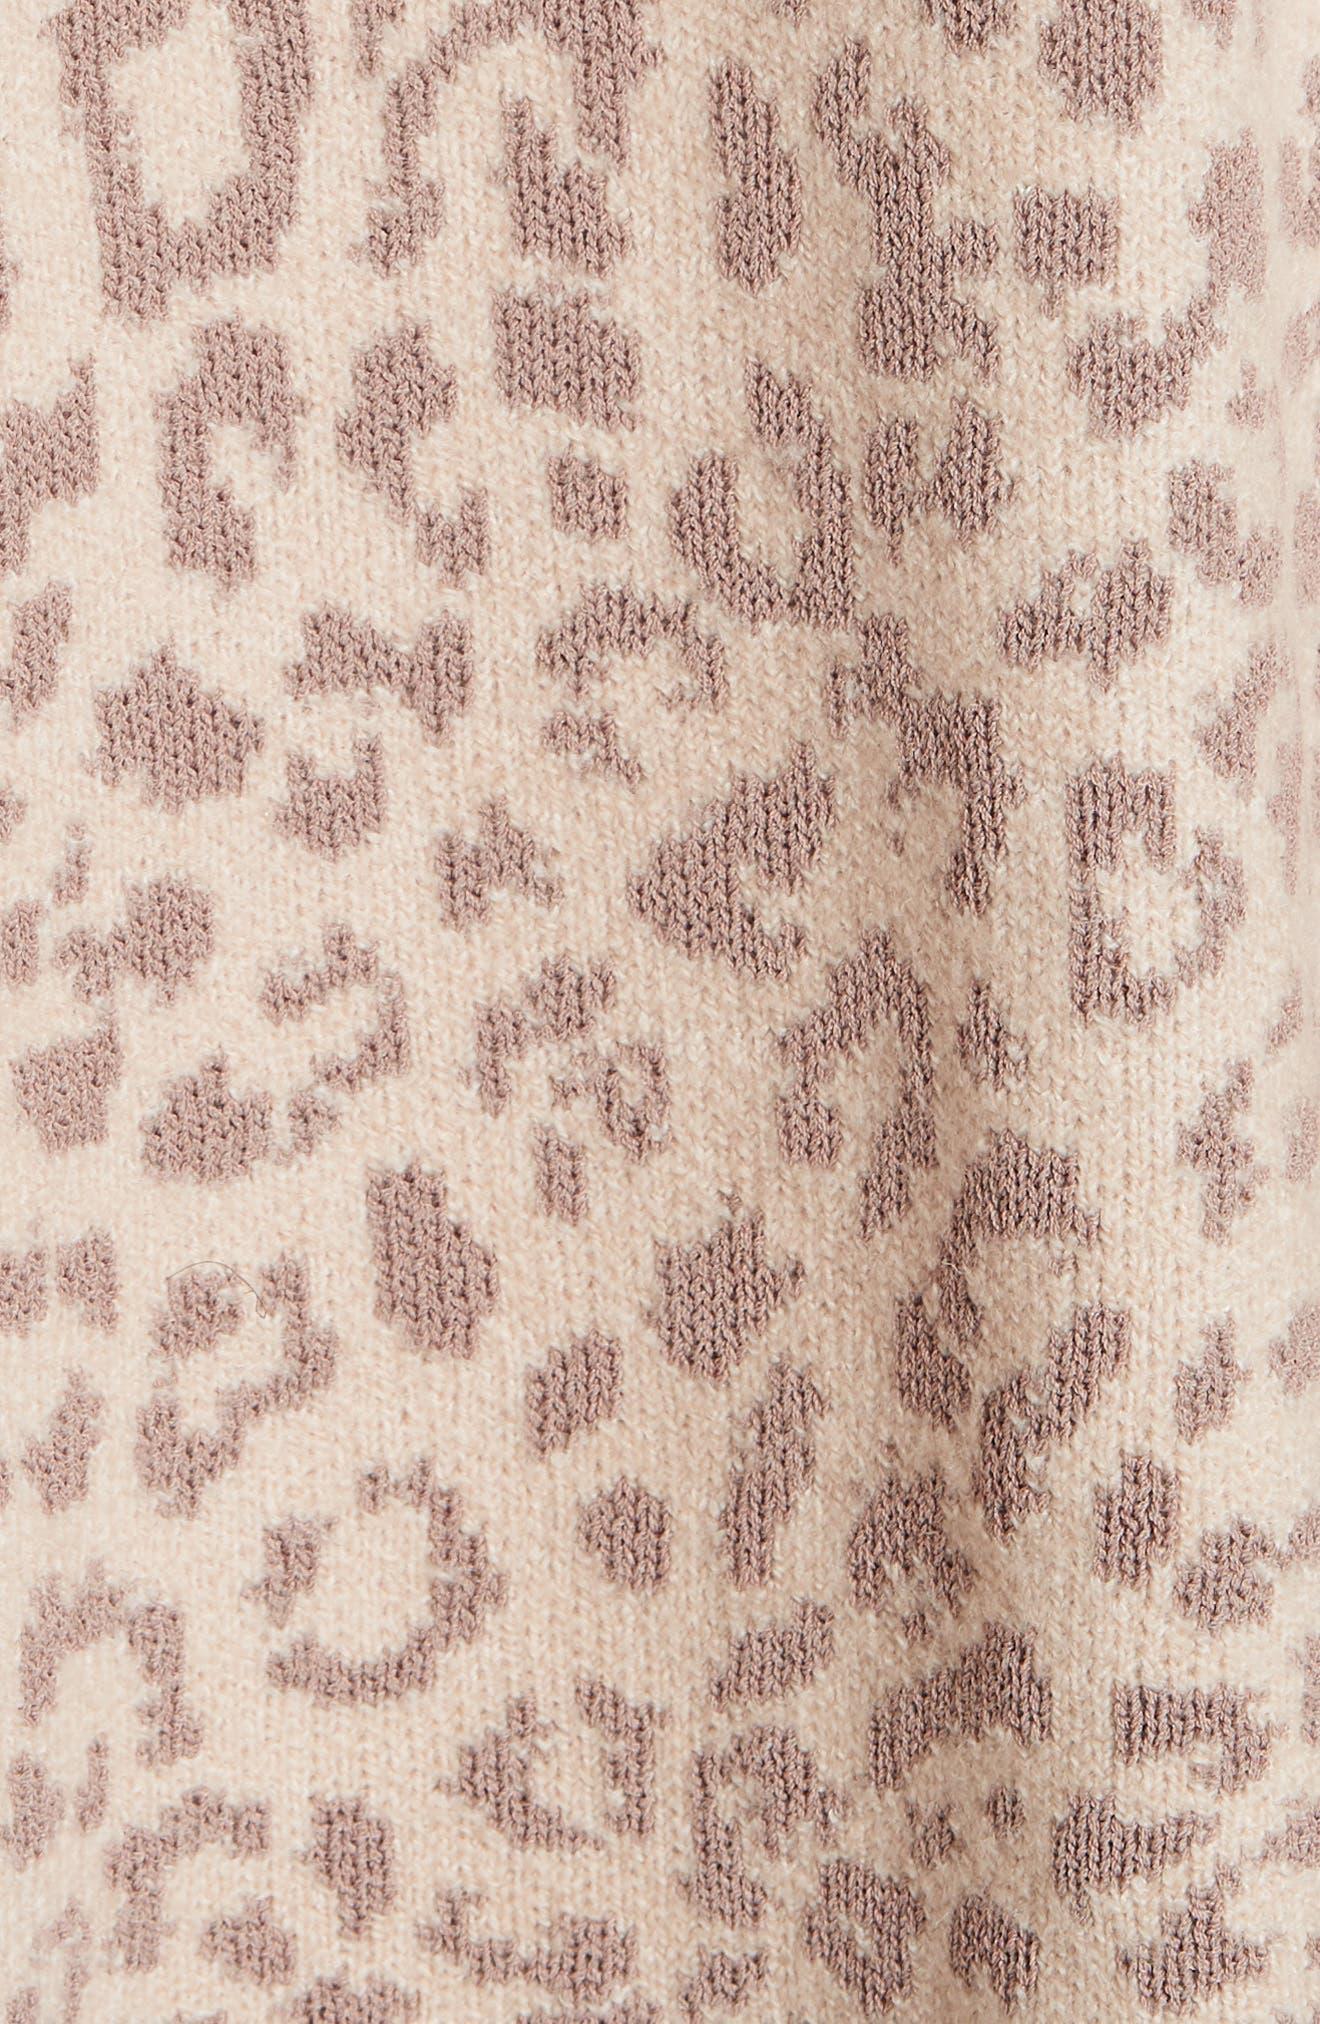 Leopard Print Sweater,                             Alternate thumbnail 5, color,                             250